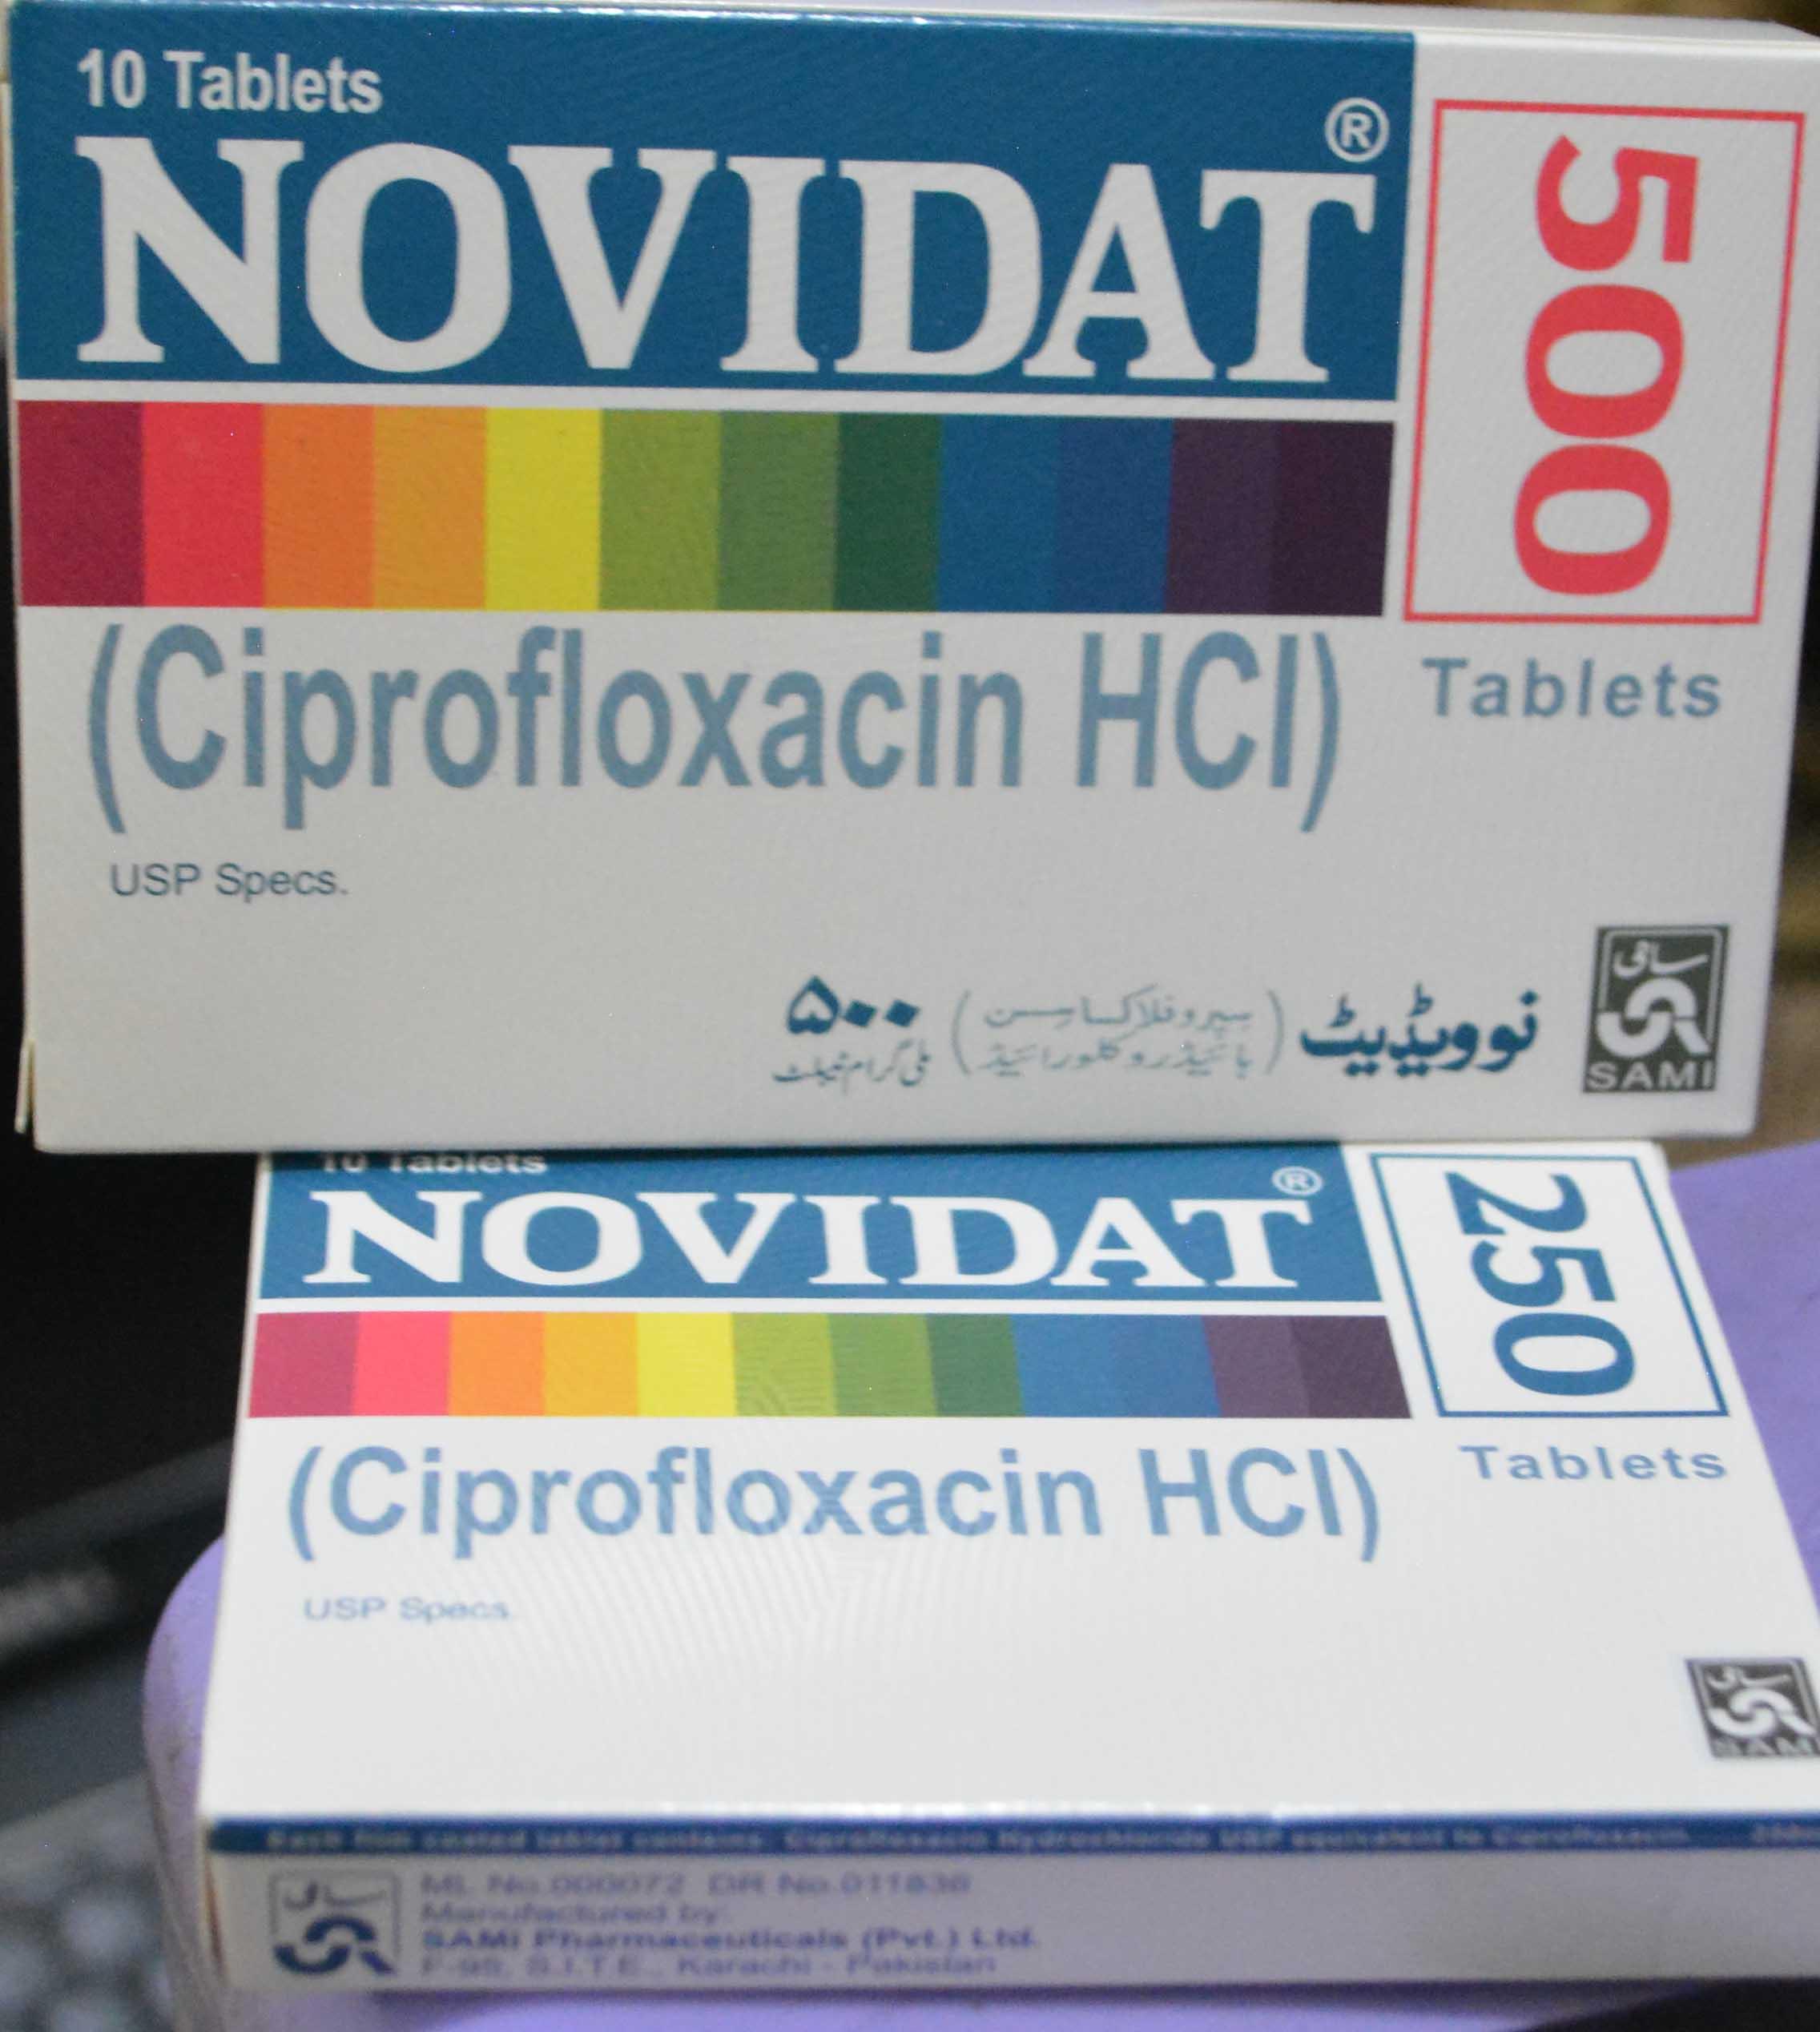 Novidat Tablets Ciprofloxacin Oral Uses side effects In Urdu